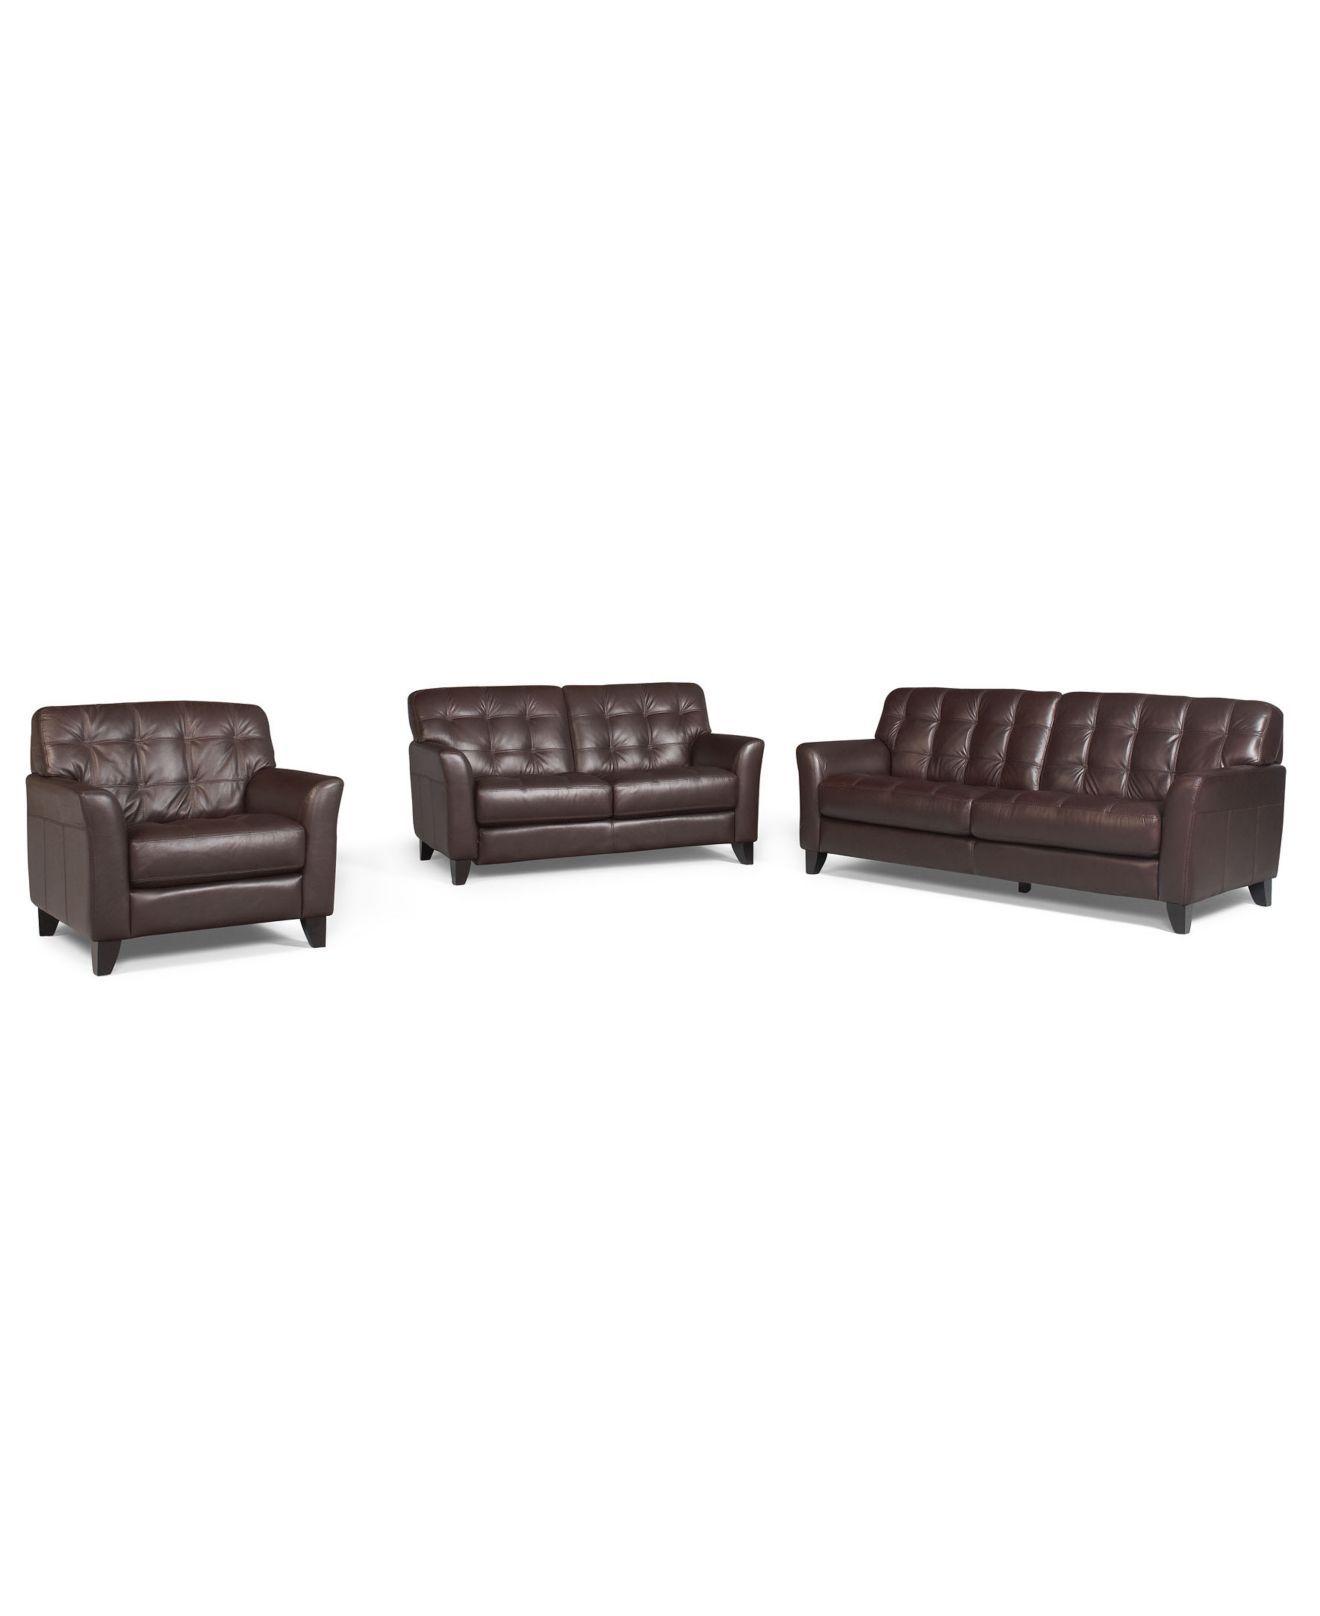 Fine Nick Leather Living Room Furniture 3 Piece Set Sofa Forskolin Free Trial Chair Design Images Forskolin Free Trialorg